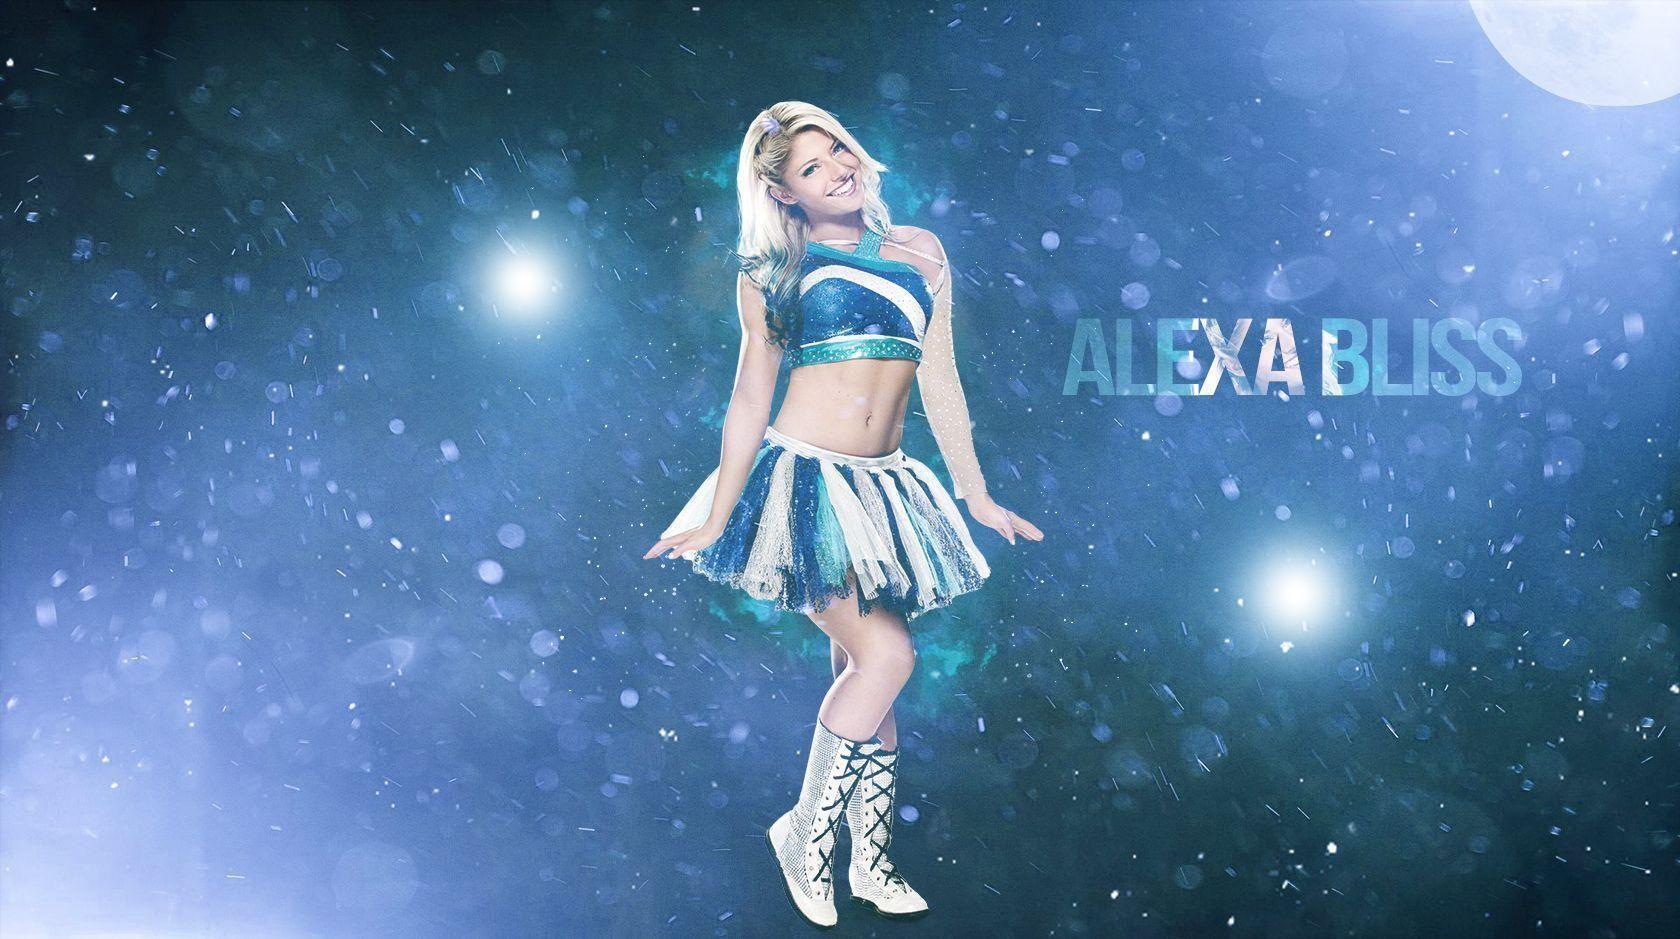 Alexa Bliss Alexa Bliss Photo Alexa Bliss Alexablisswwe Wwe Photo Wwe Wrestlers Alexa Bliss Wallpapers Hd Wallpapers Wwe Wallp Alexa Hd Wallpaper Bliss